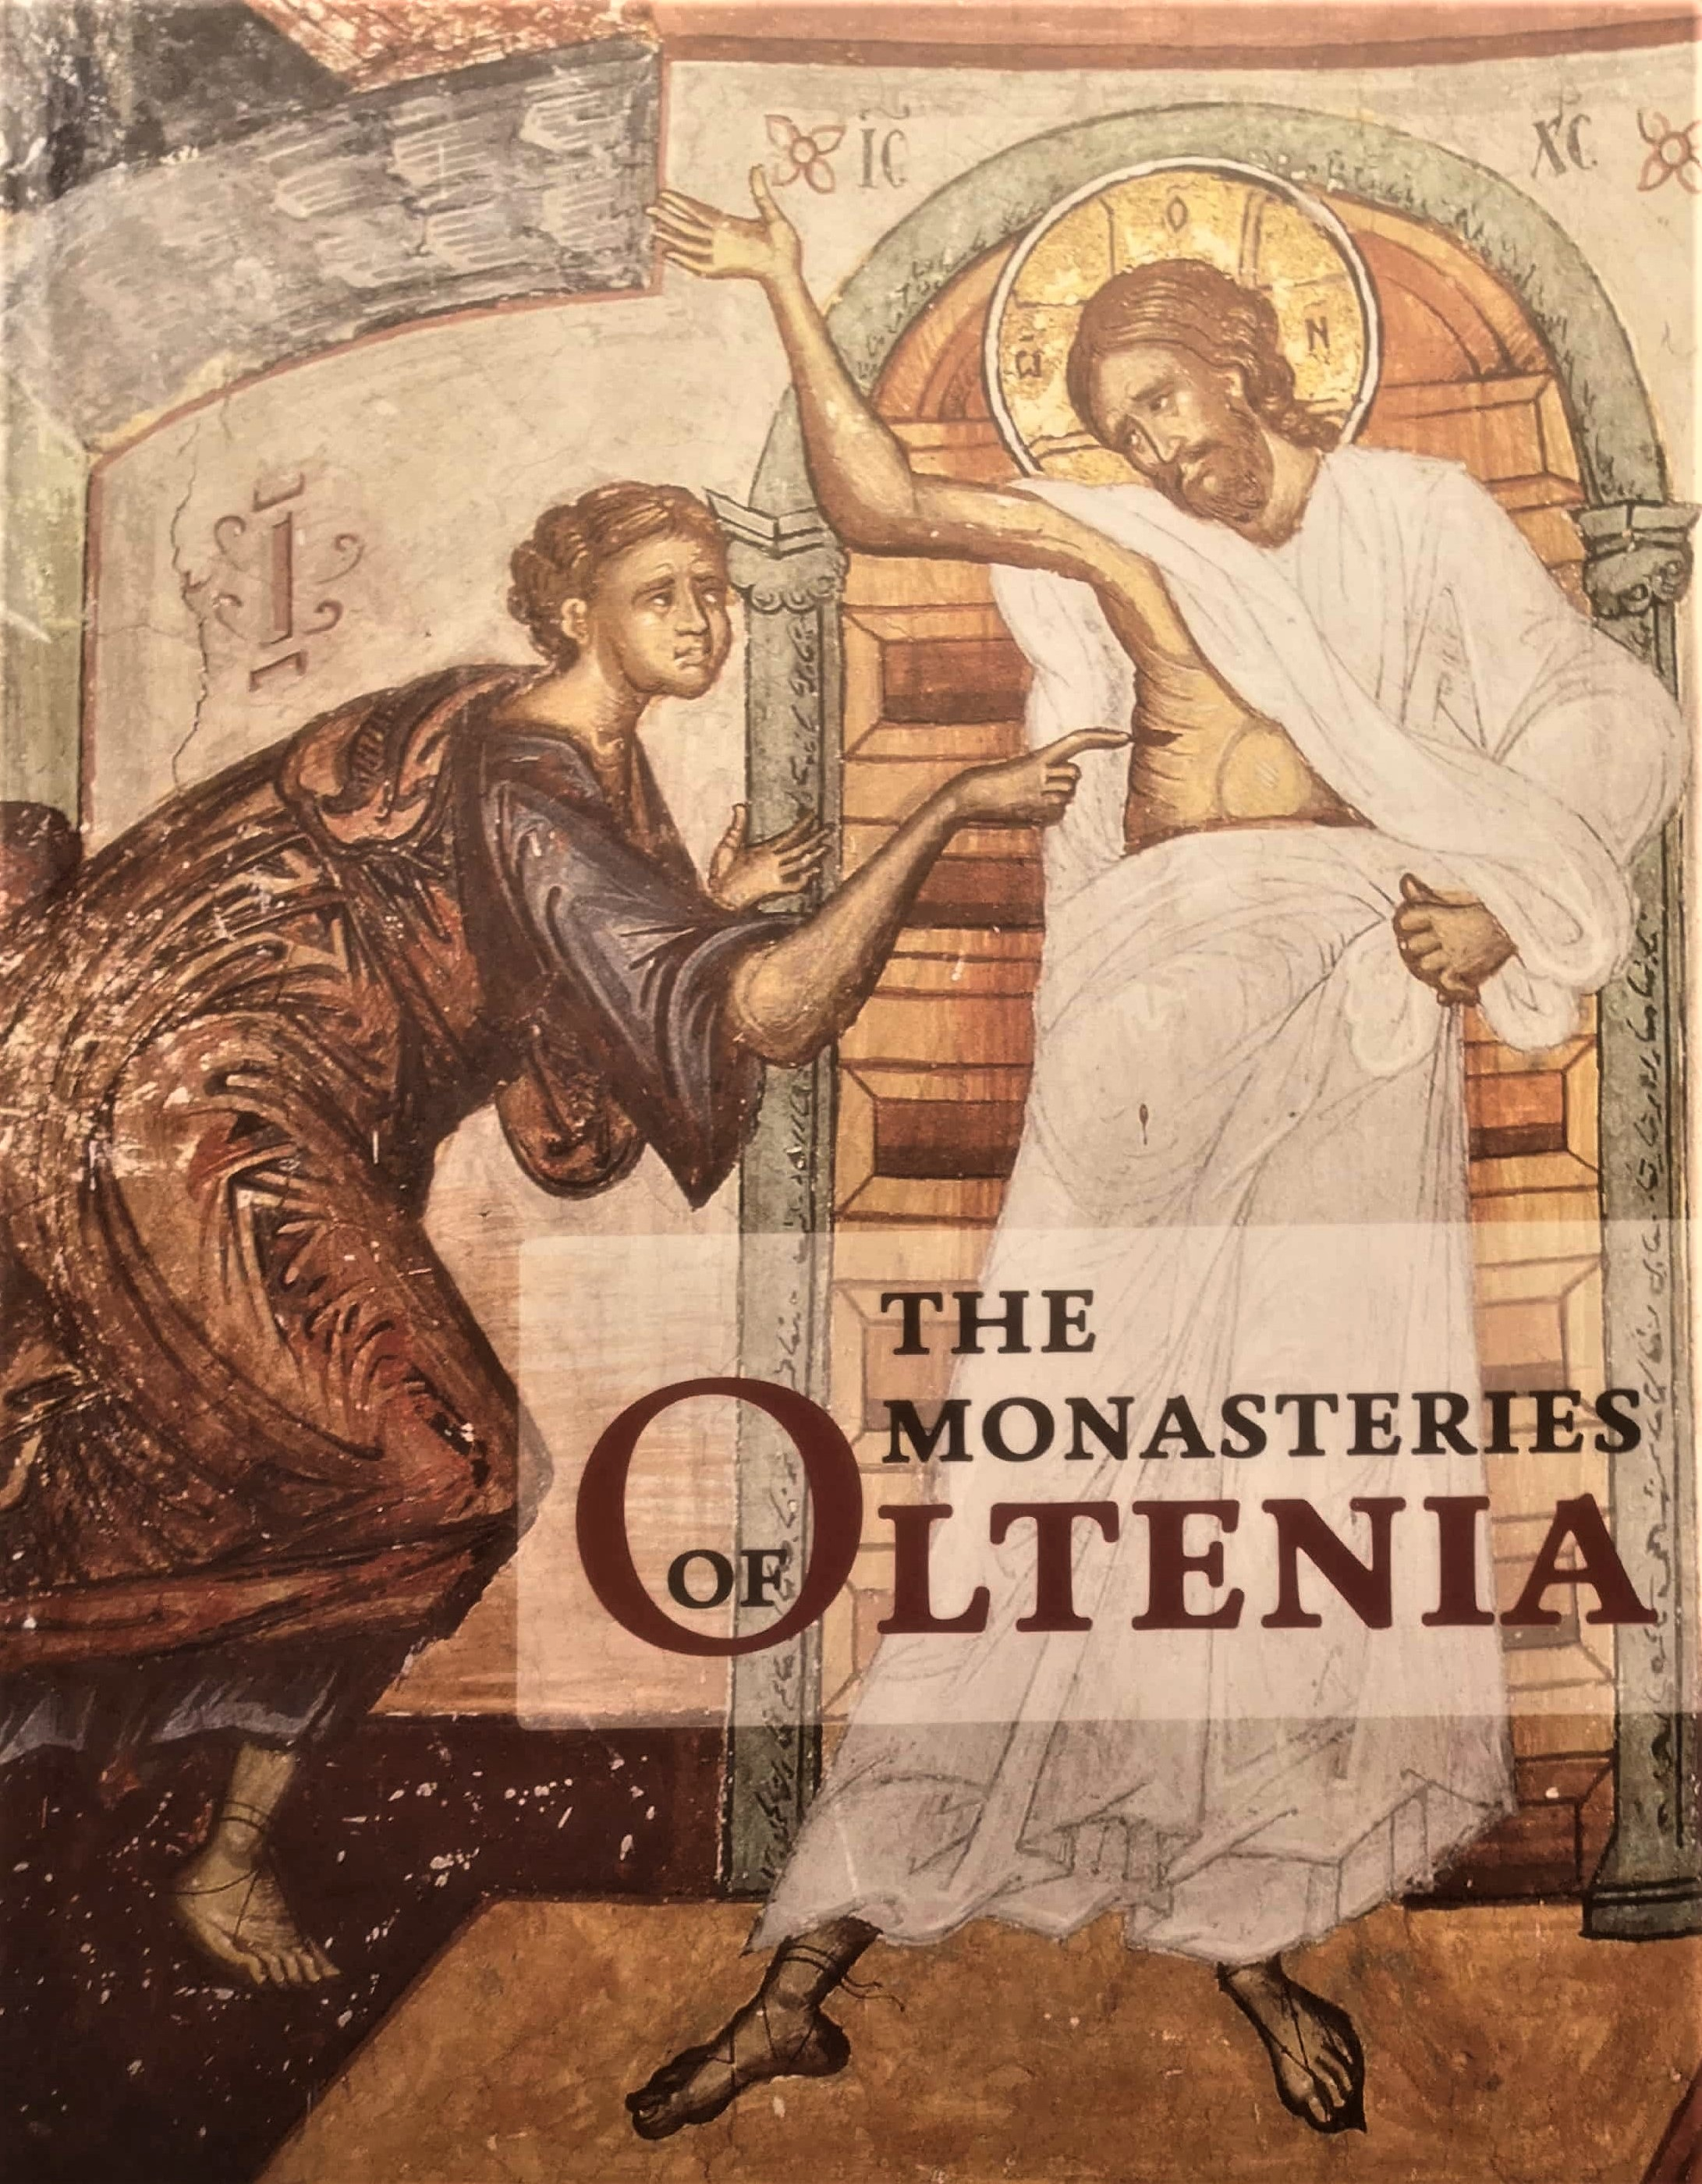 Album Manastirile Olteniei. Arta si spiritualitate/ The Monasteries of Oltenia